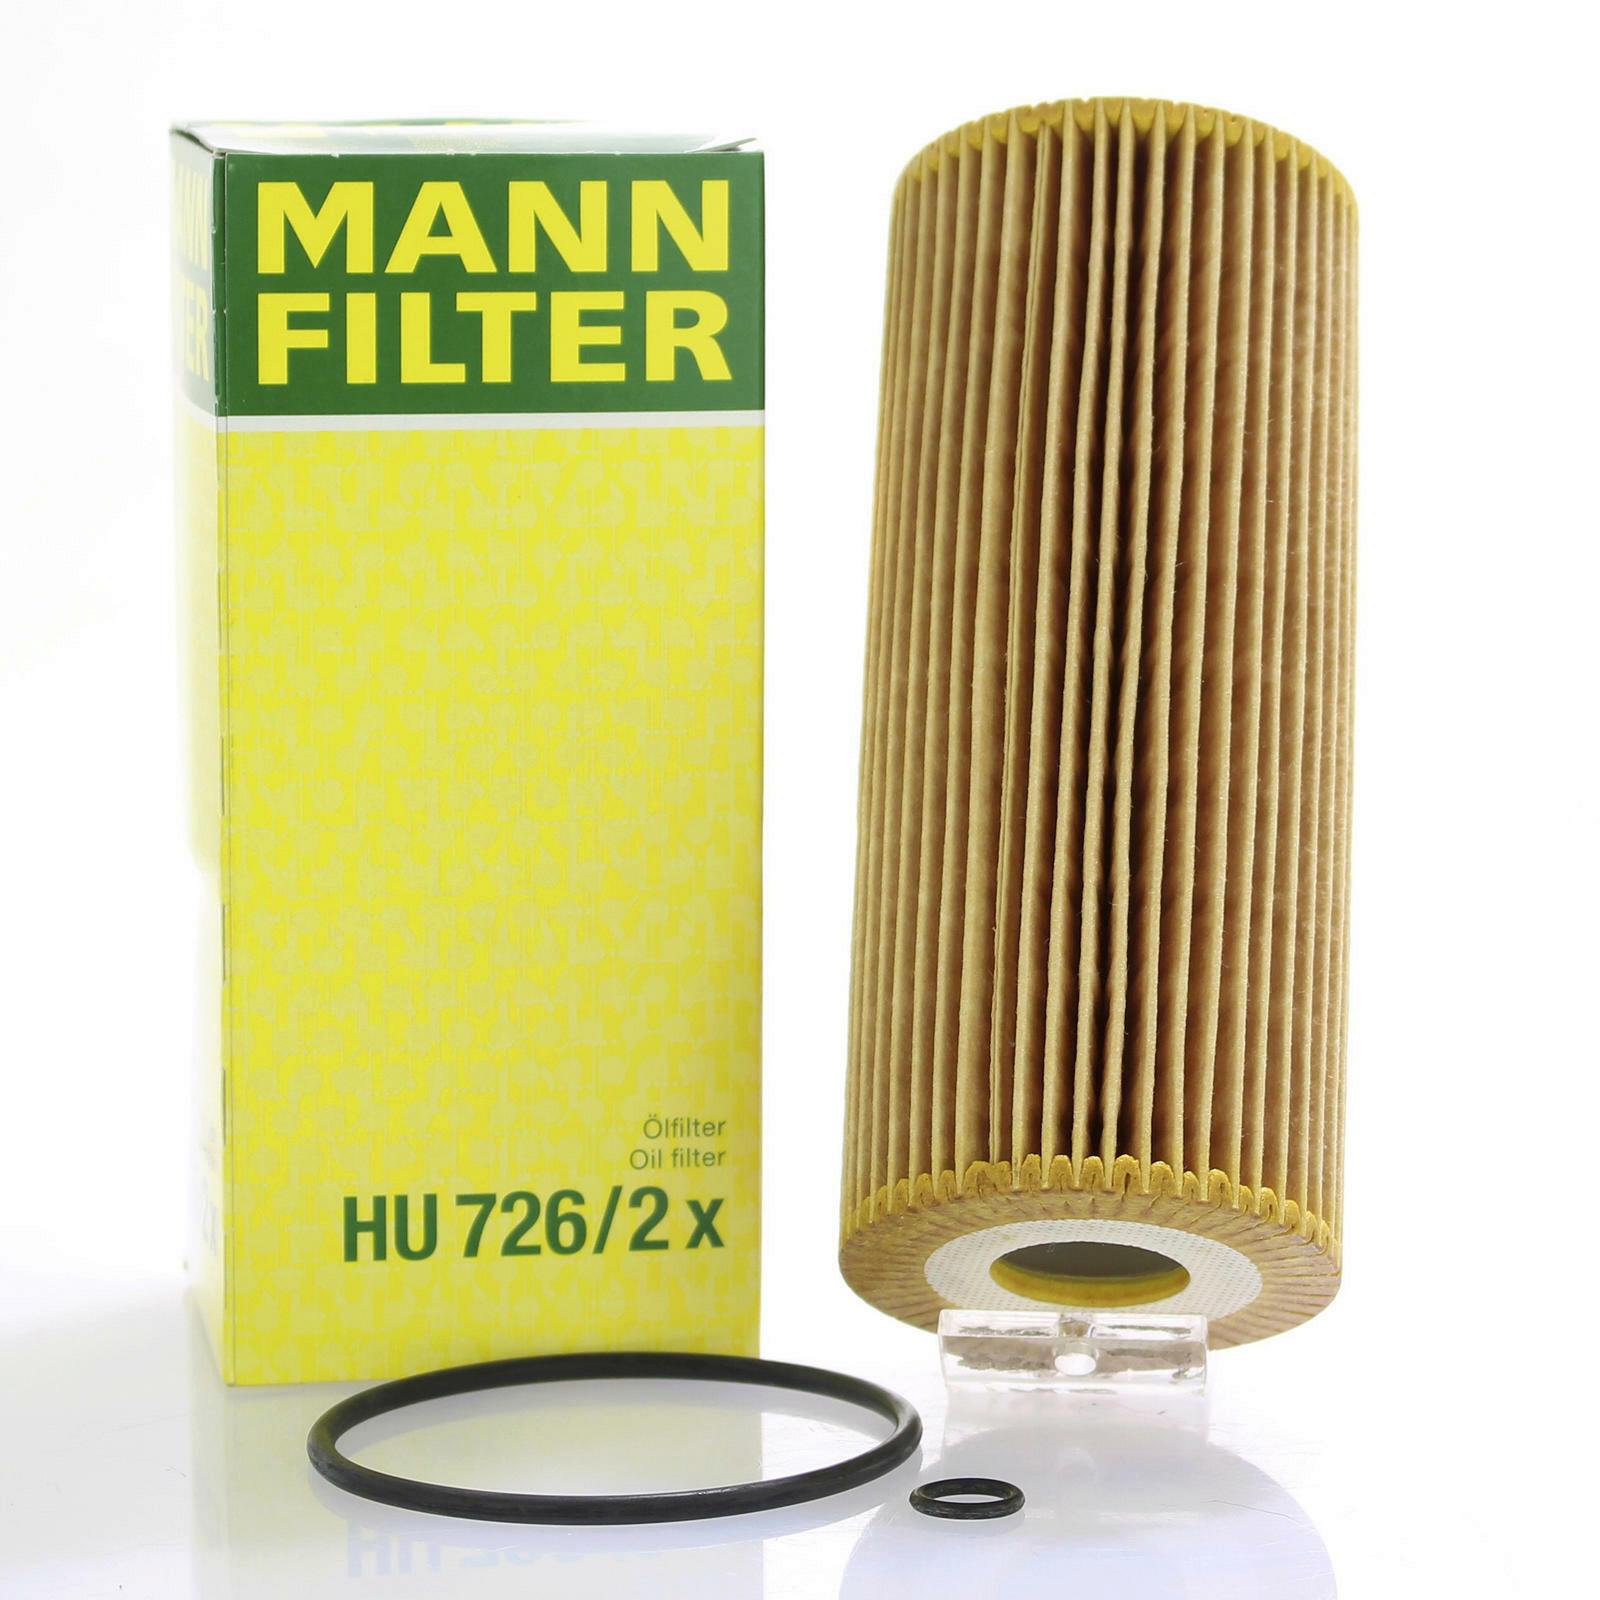 MANN-FILTER Oil Filter evotop